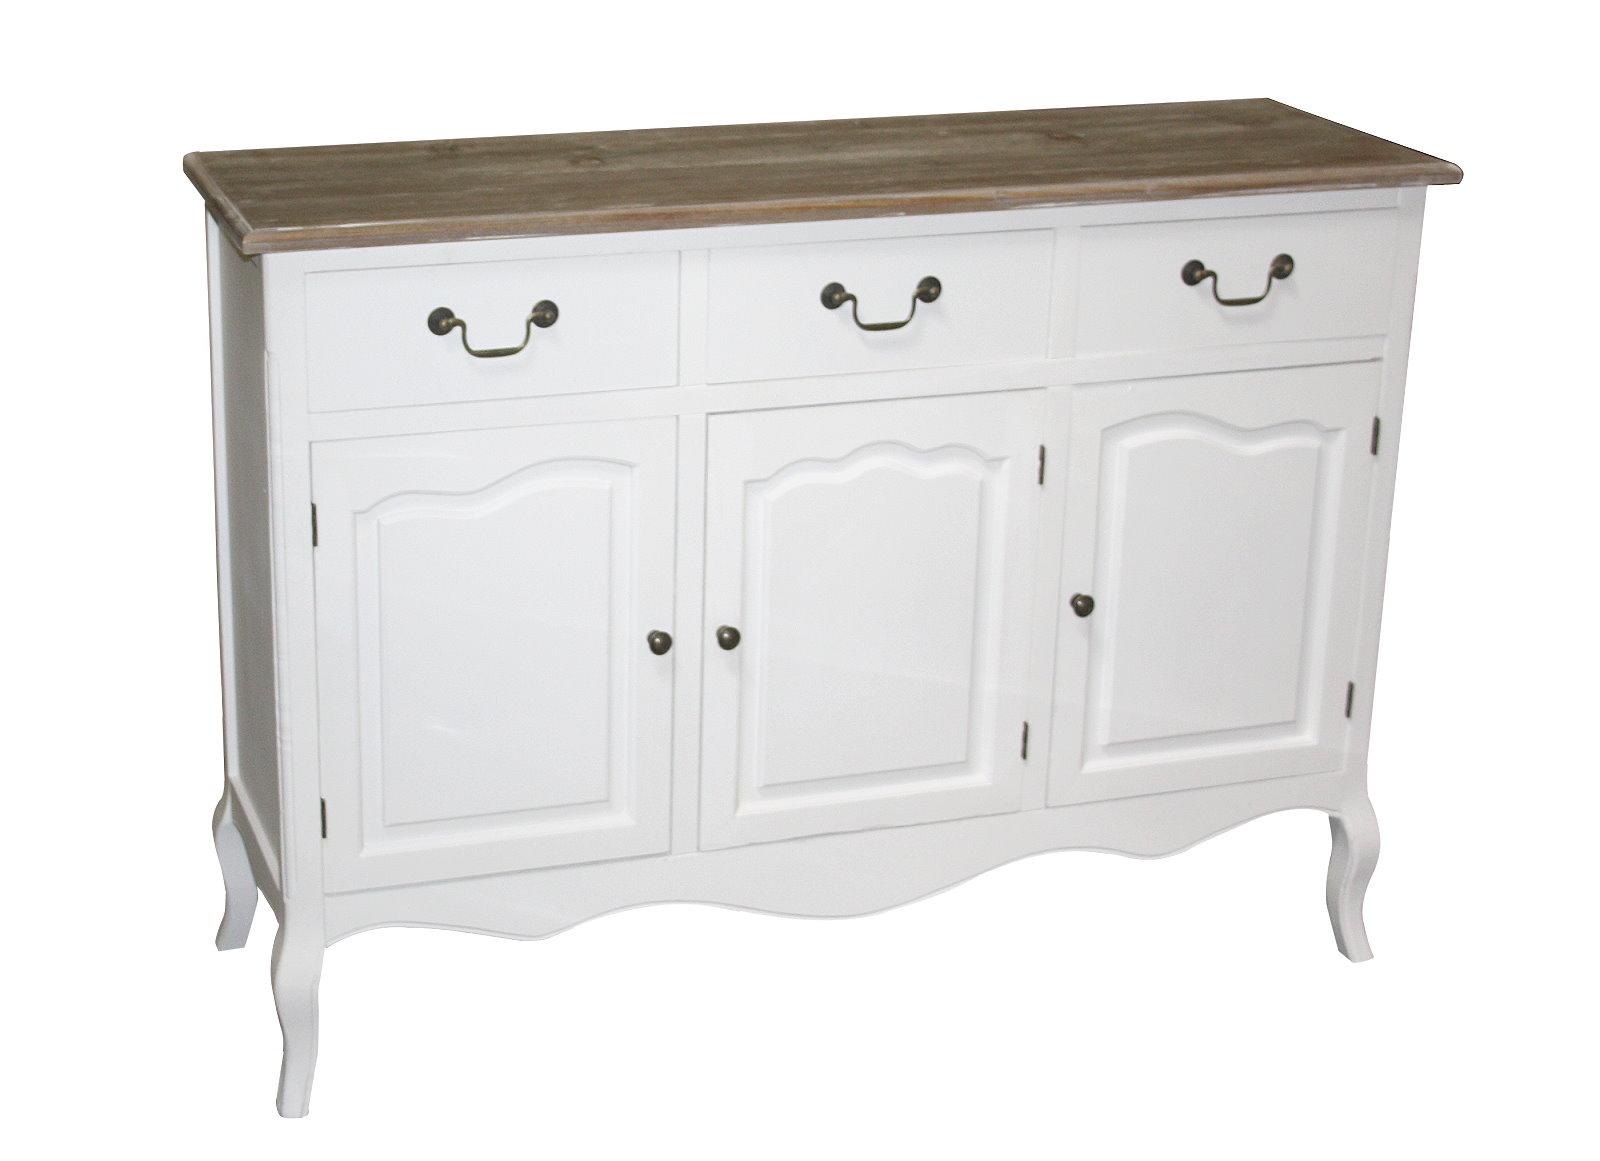 maison belfort kommode mauriac ii shabby look sideboard weiss schrank anrichte. Black Bedroom Furniture Sets. Home Design Ideas